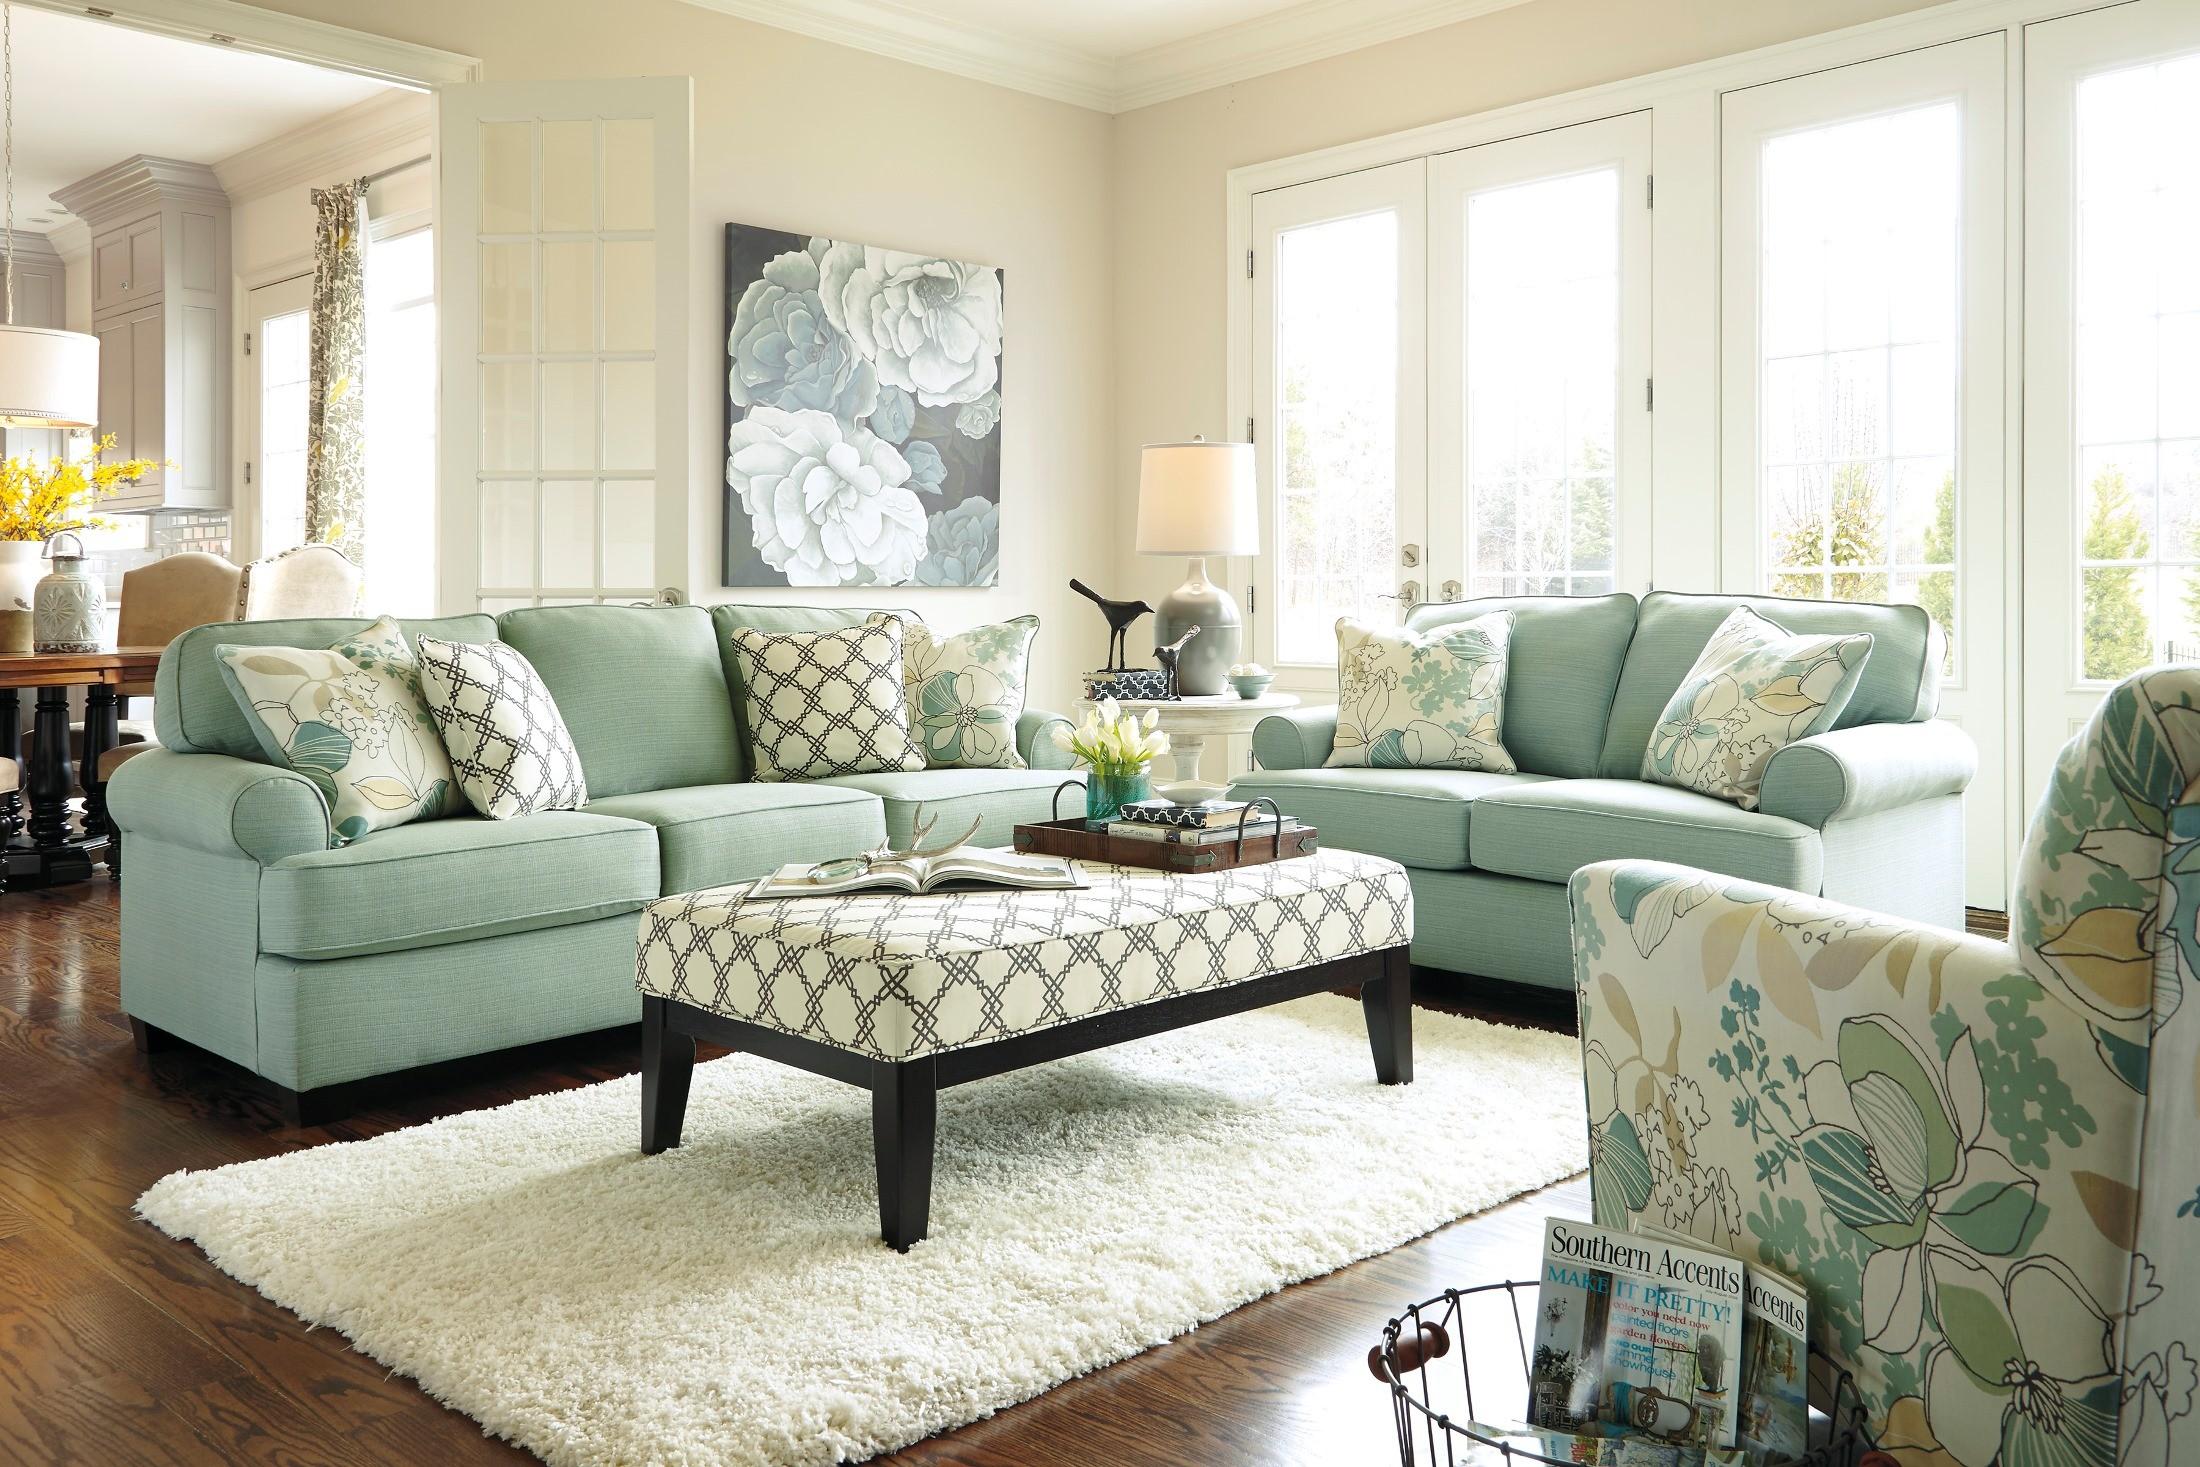 Daystar Living Room Set From Ashley (28200-38-35